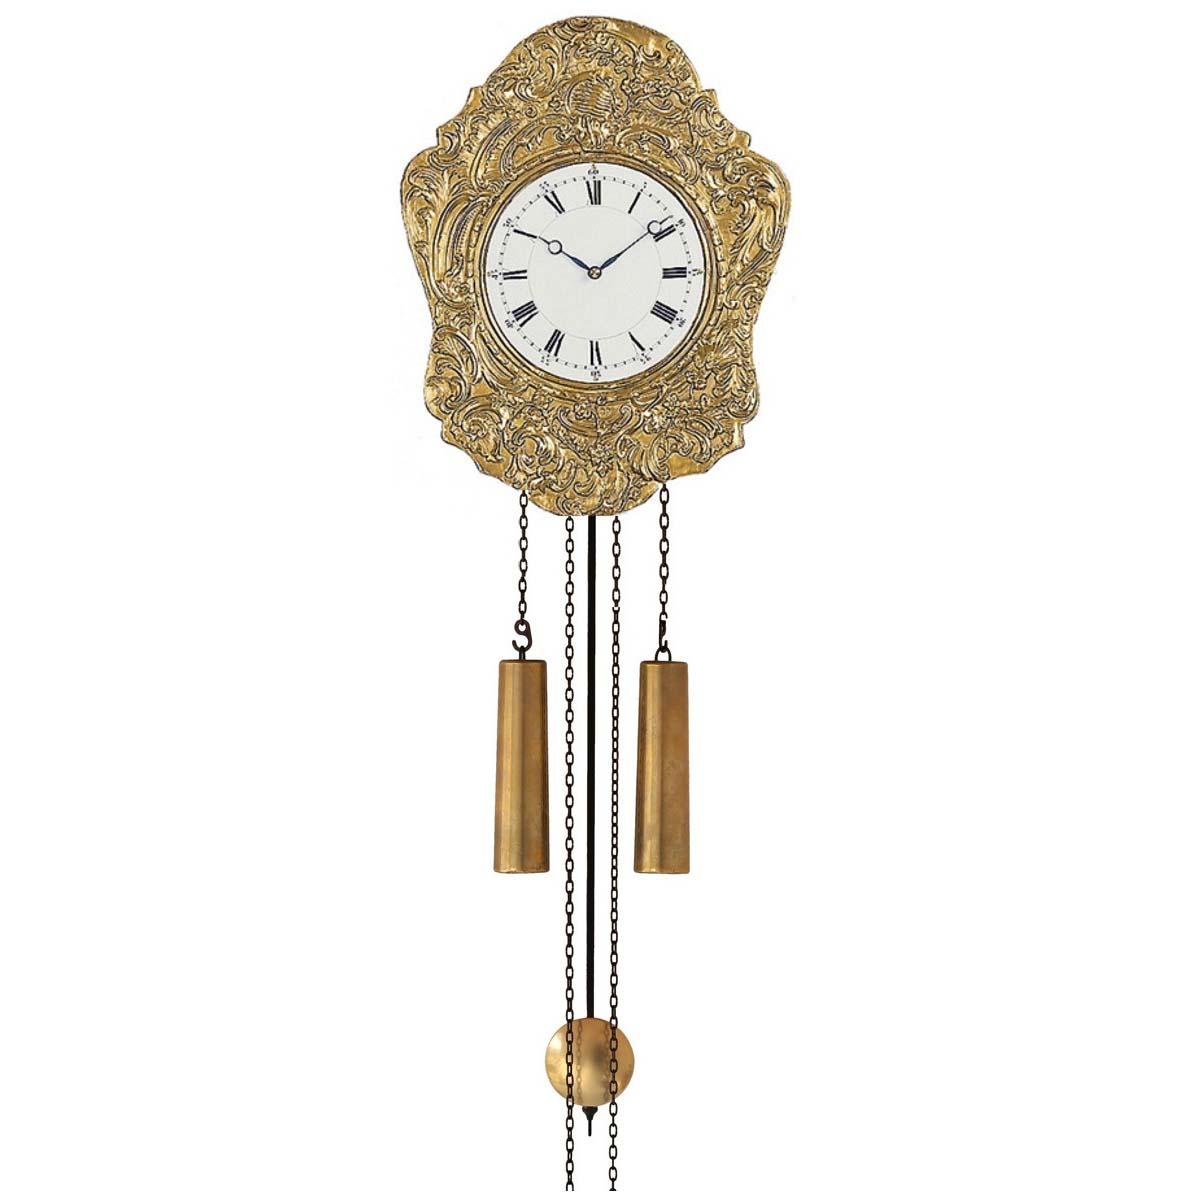 WU1110 Traditional Wall Clock